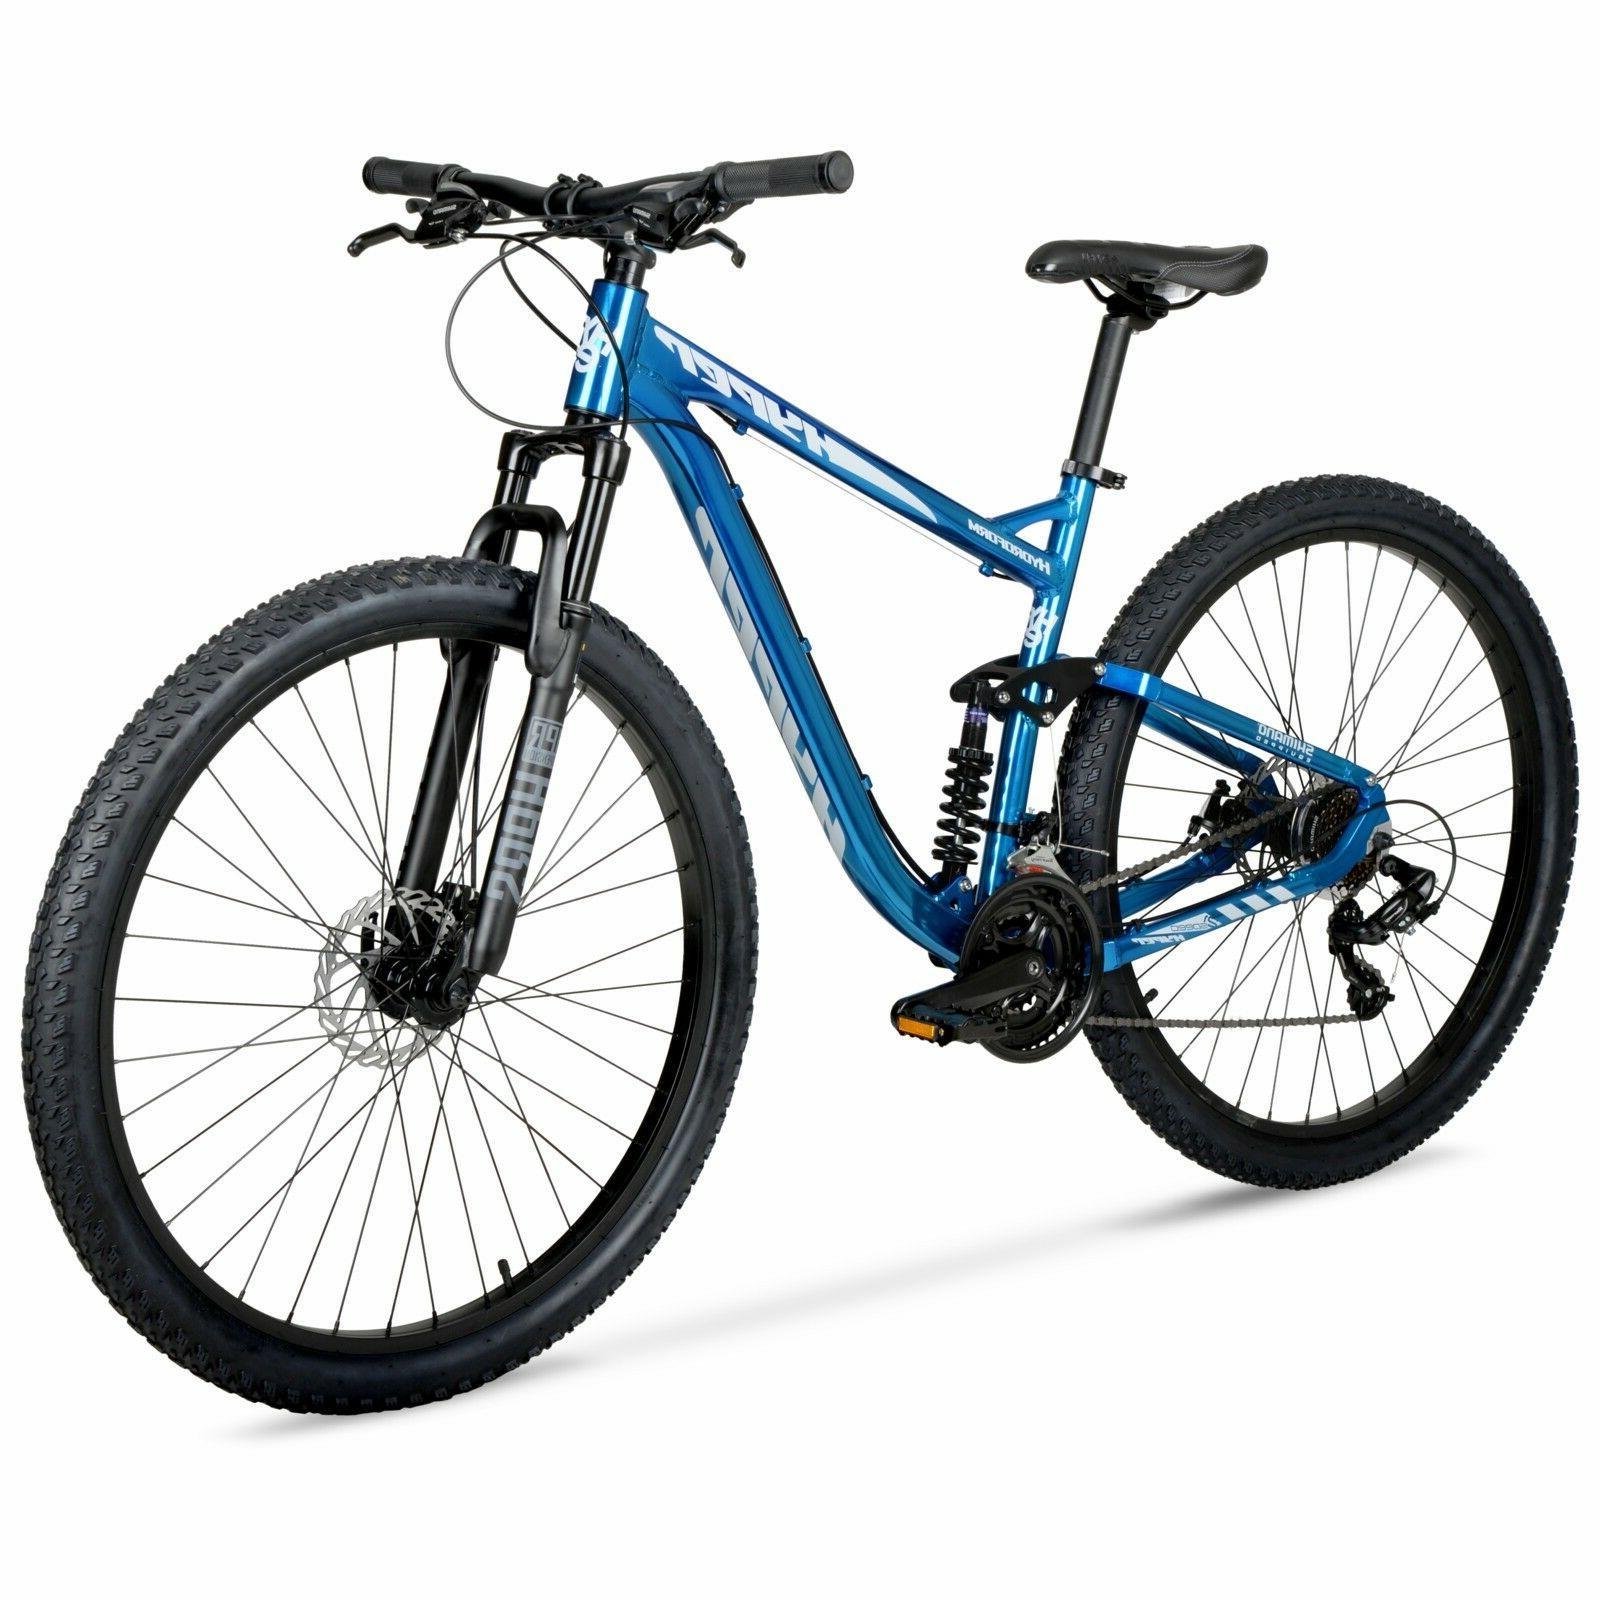 Hyper Lightweight Hydro-Form Bike